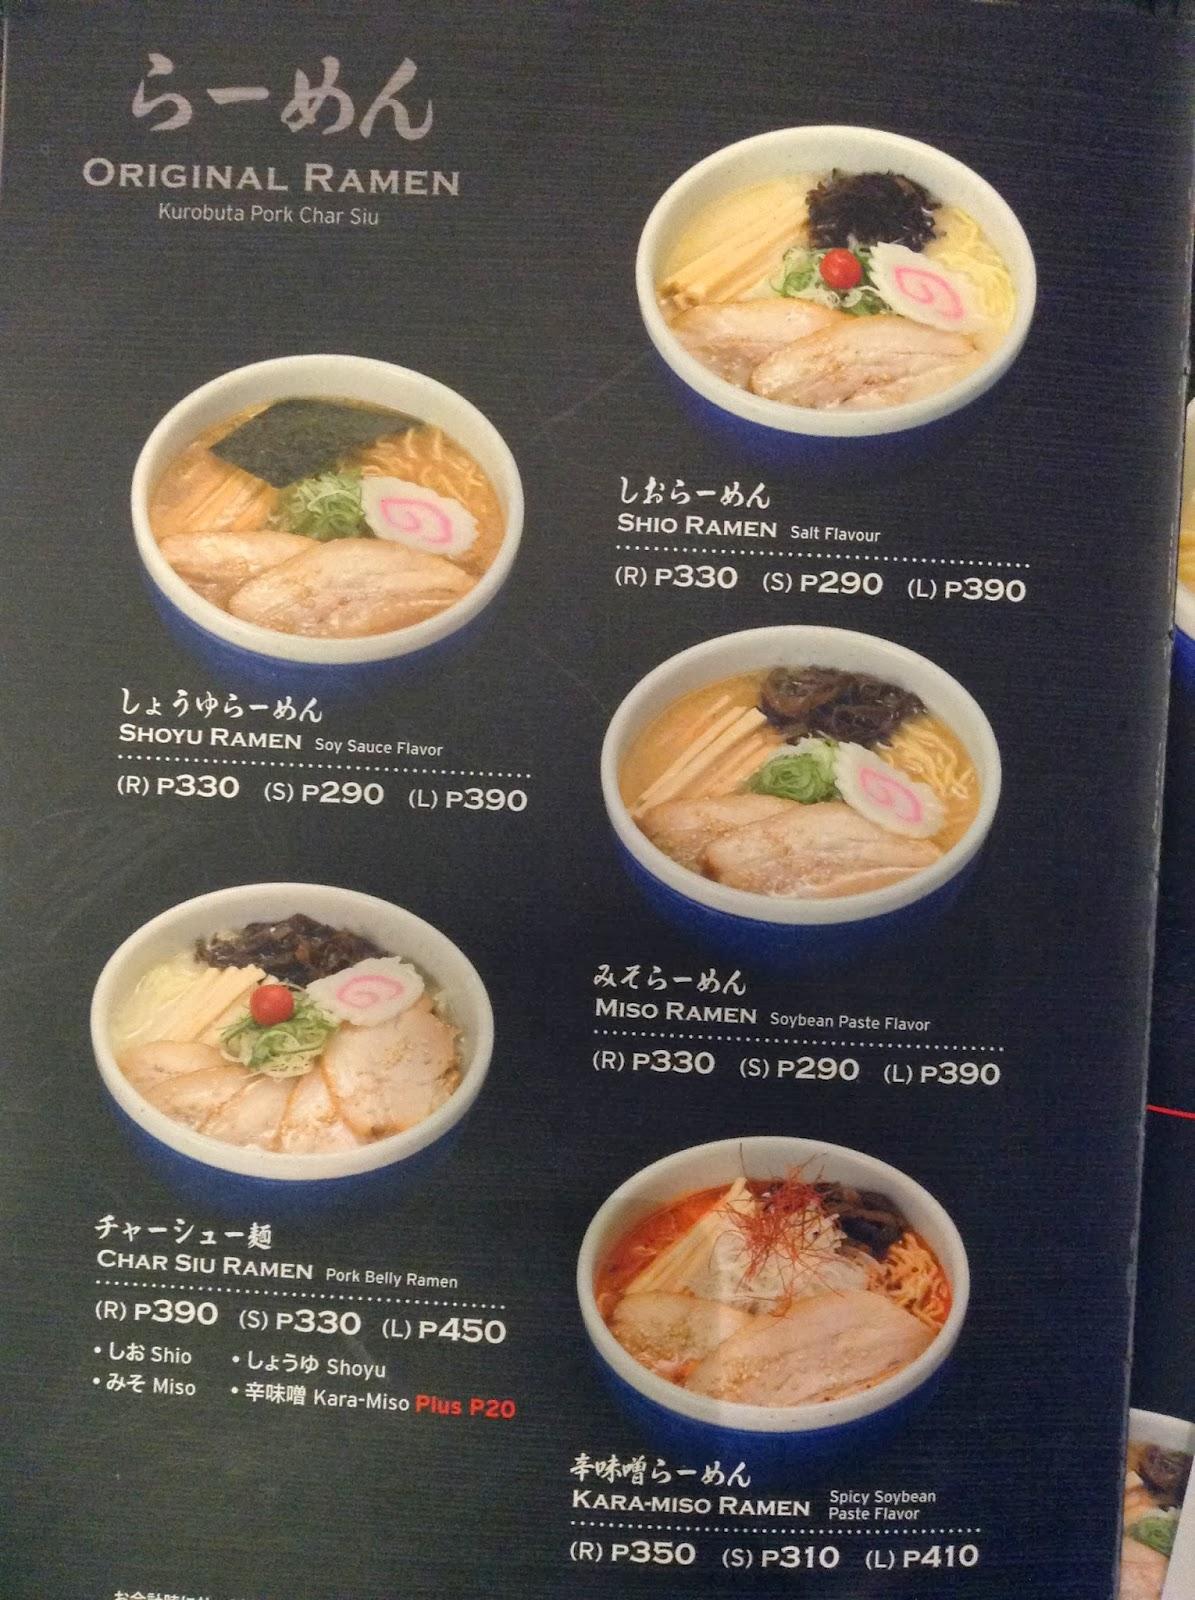 Ramen Santouka menu